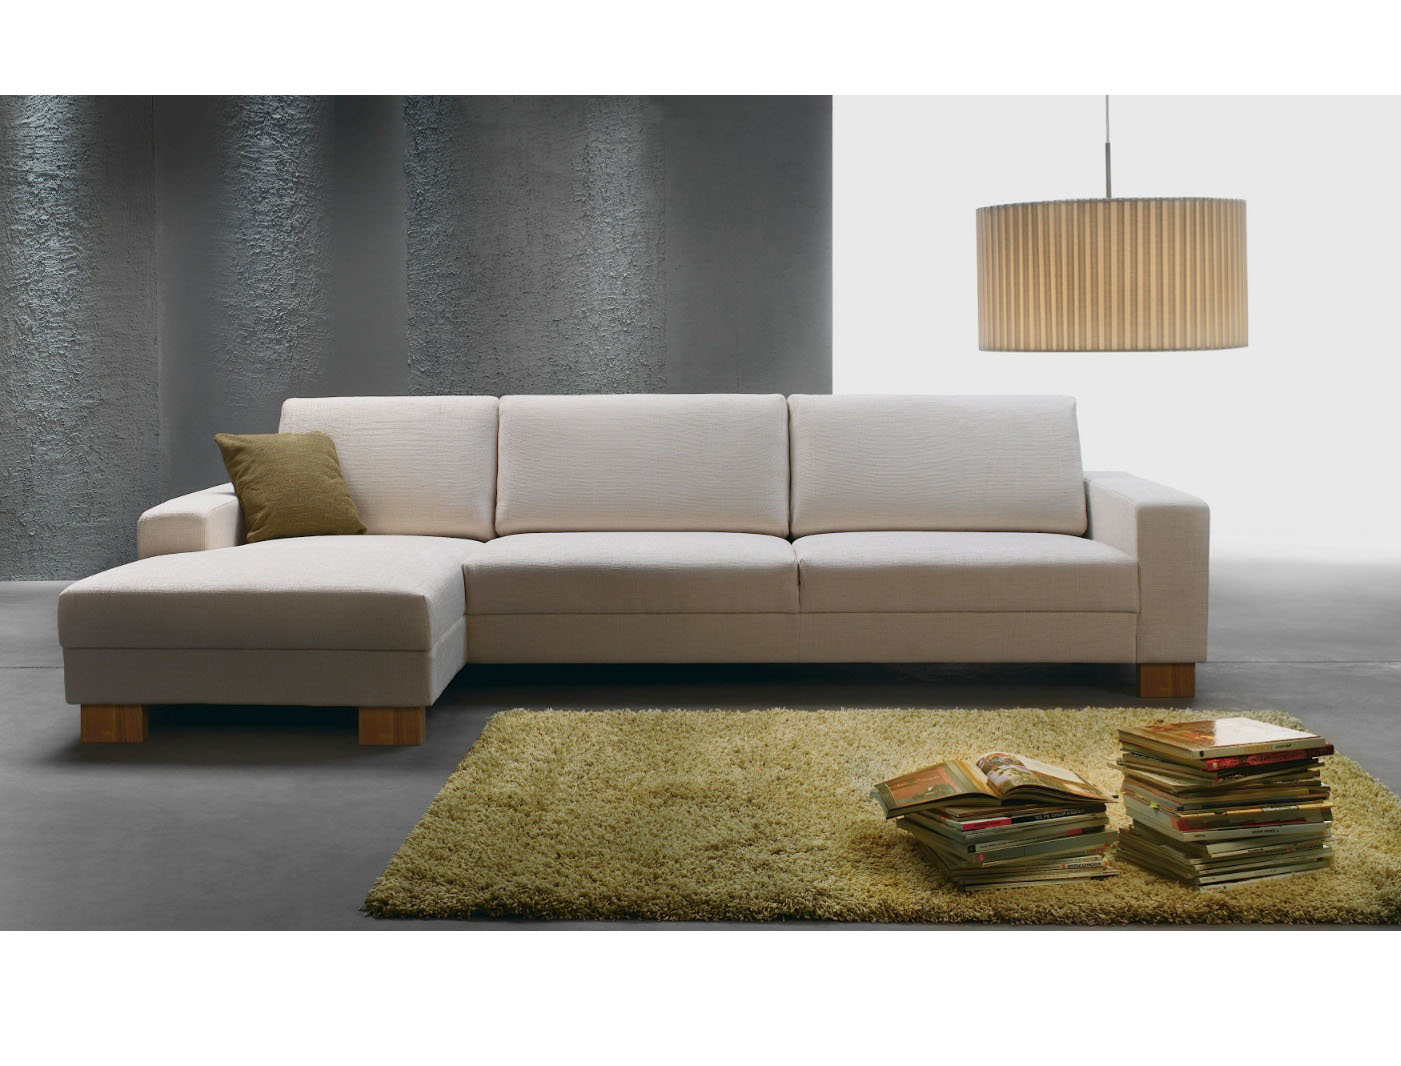 Lantana 3 Seater Sofa-30052